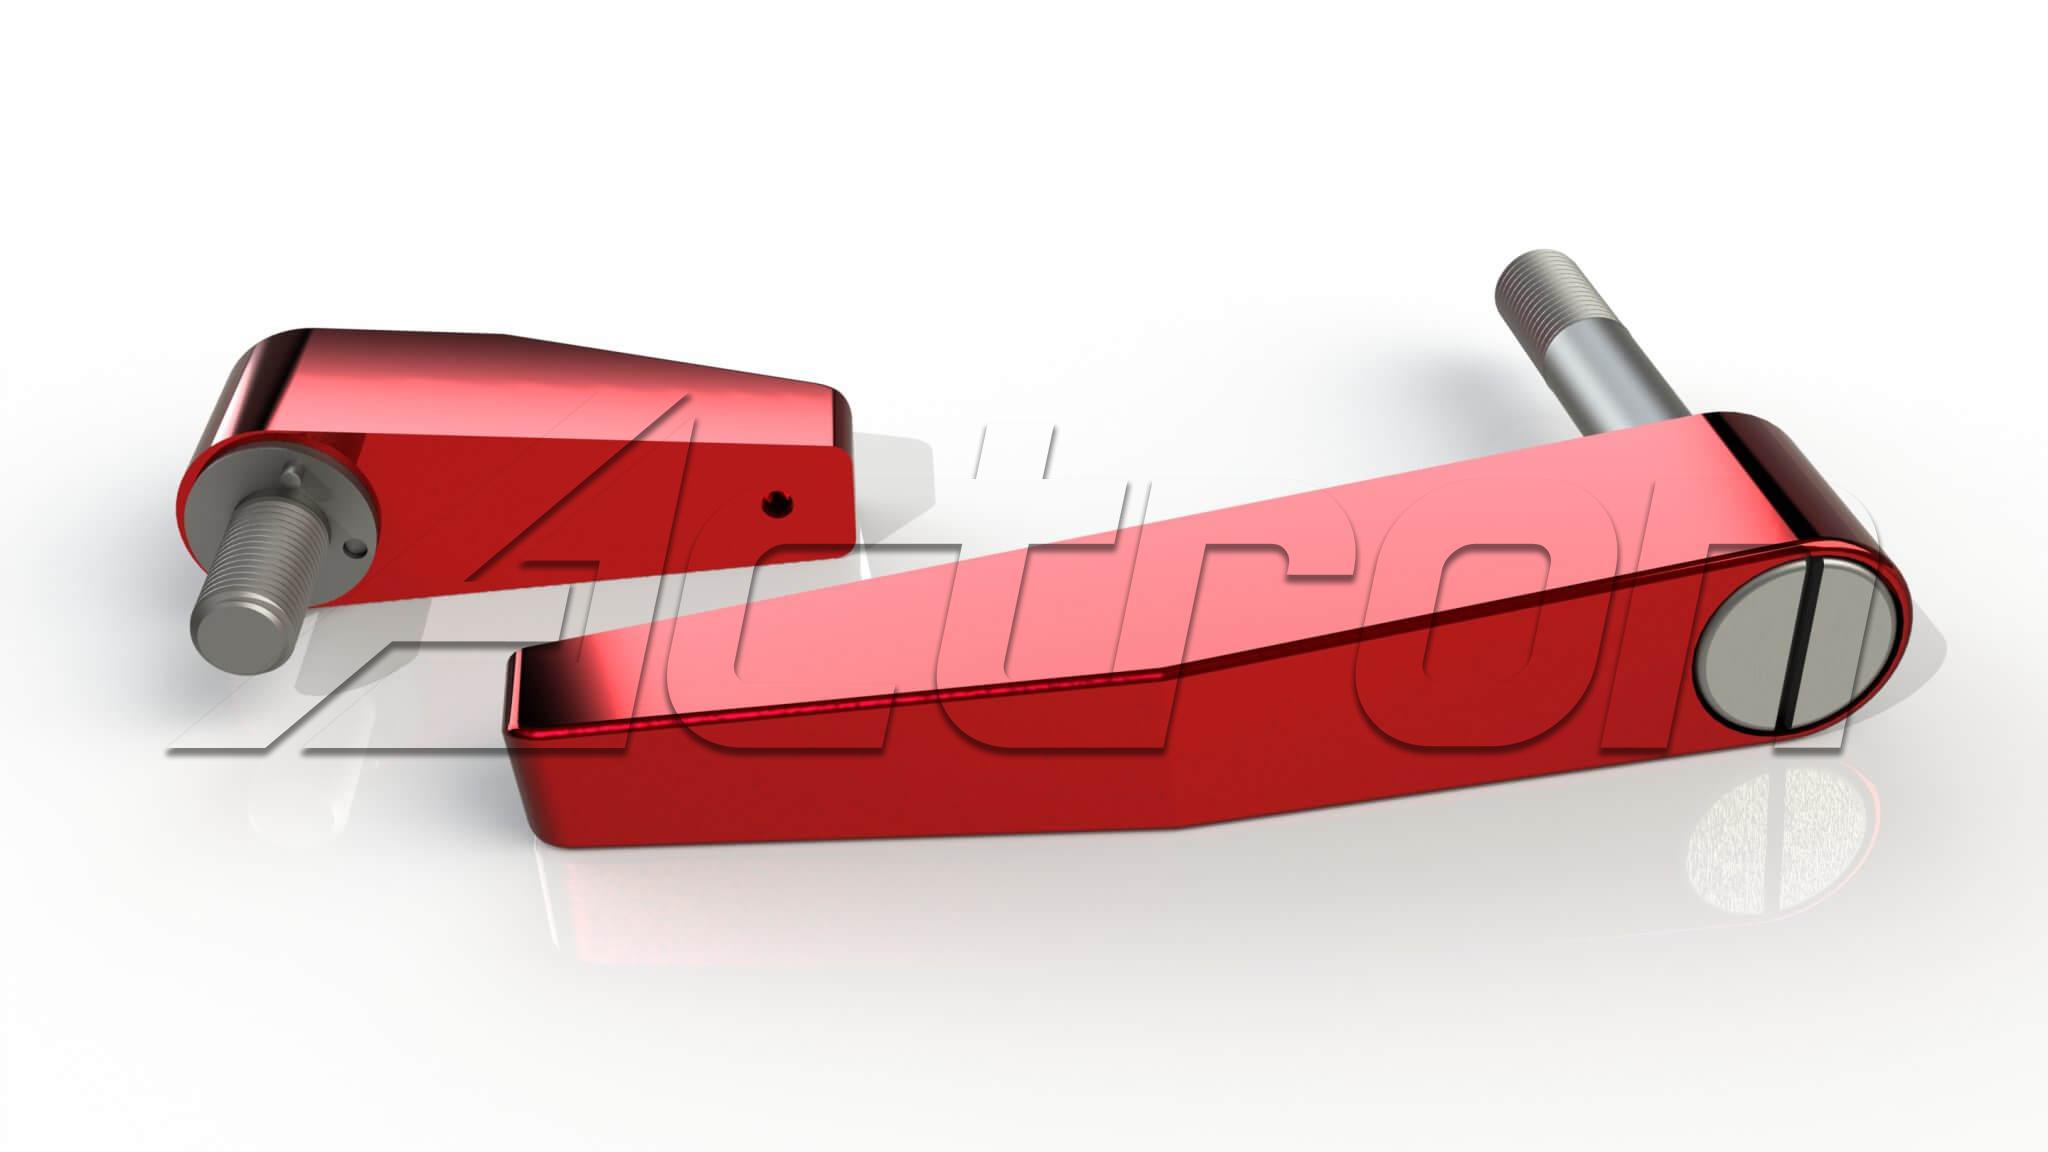 1-4-turn-retainer-4633-a35628.jpg